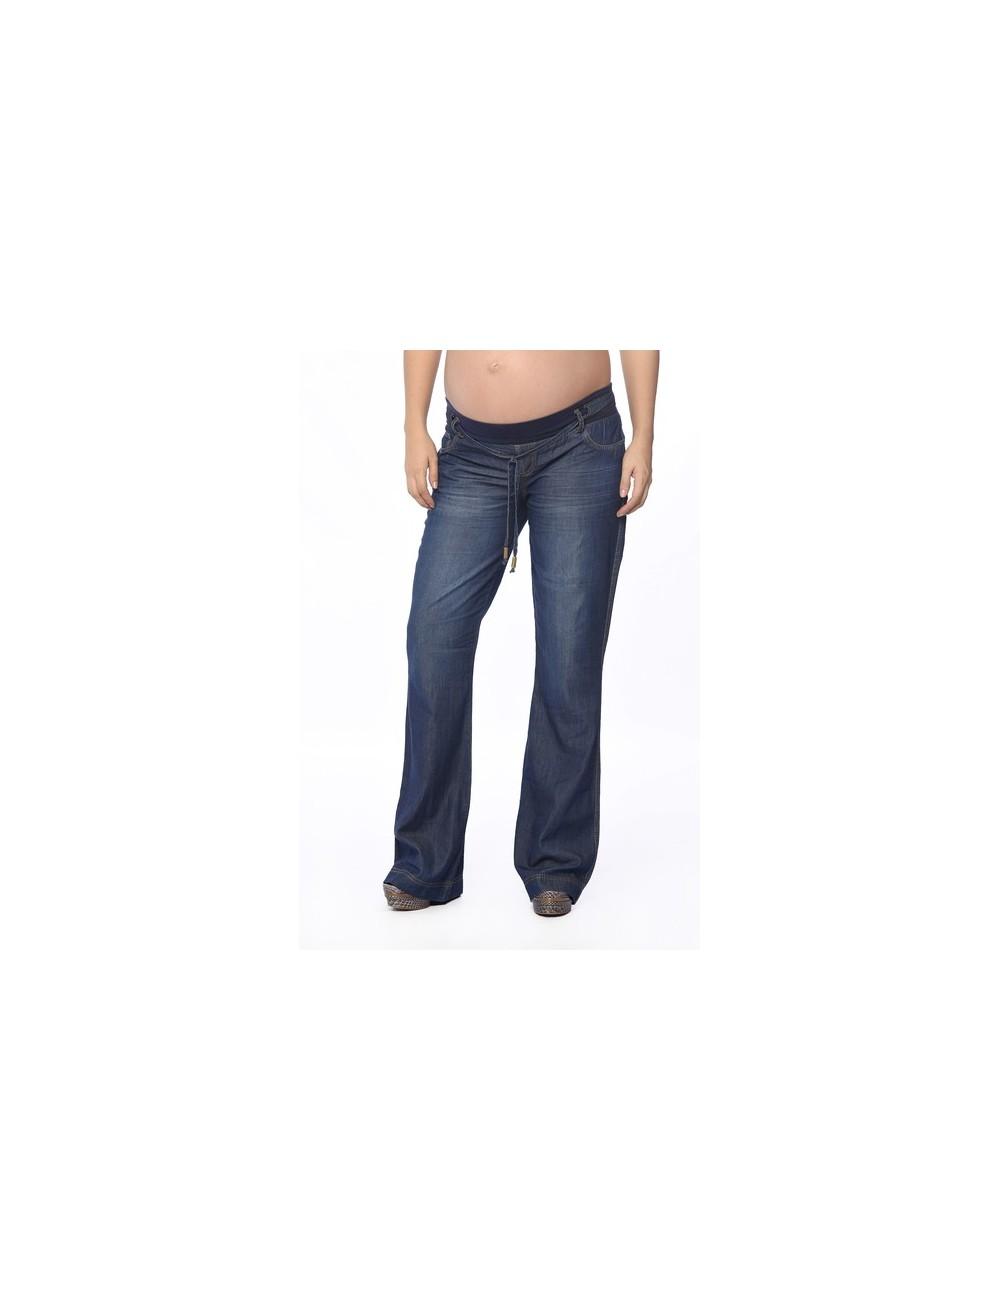 Jeans Aniston